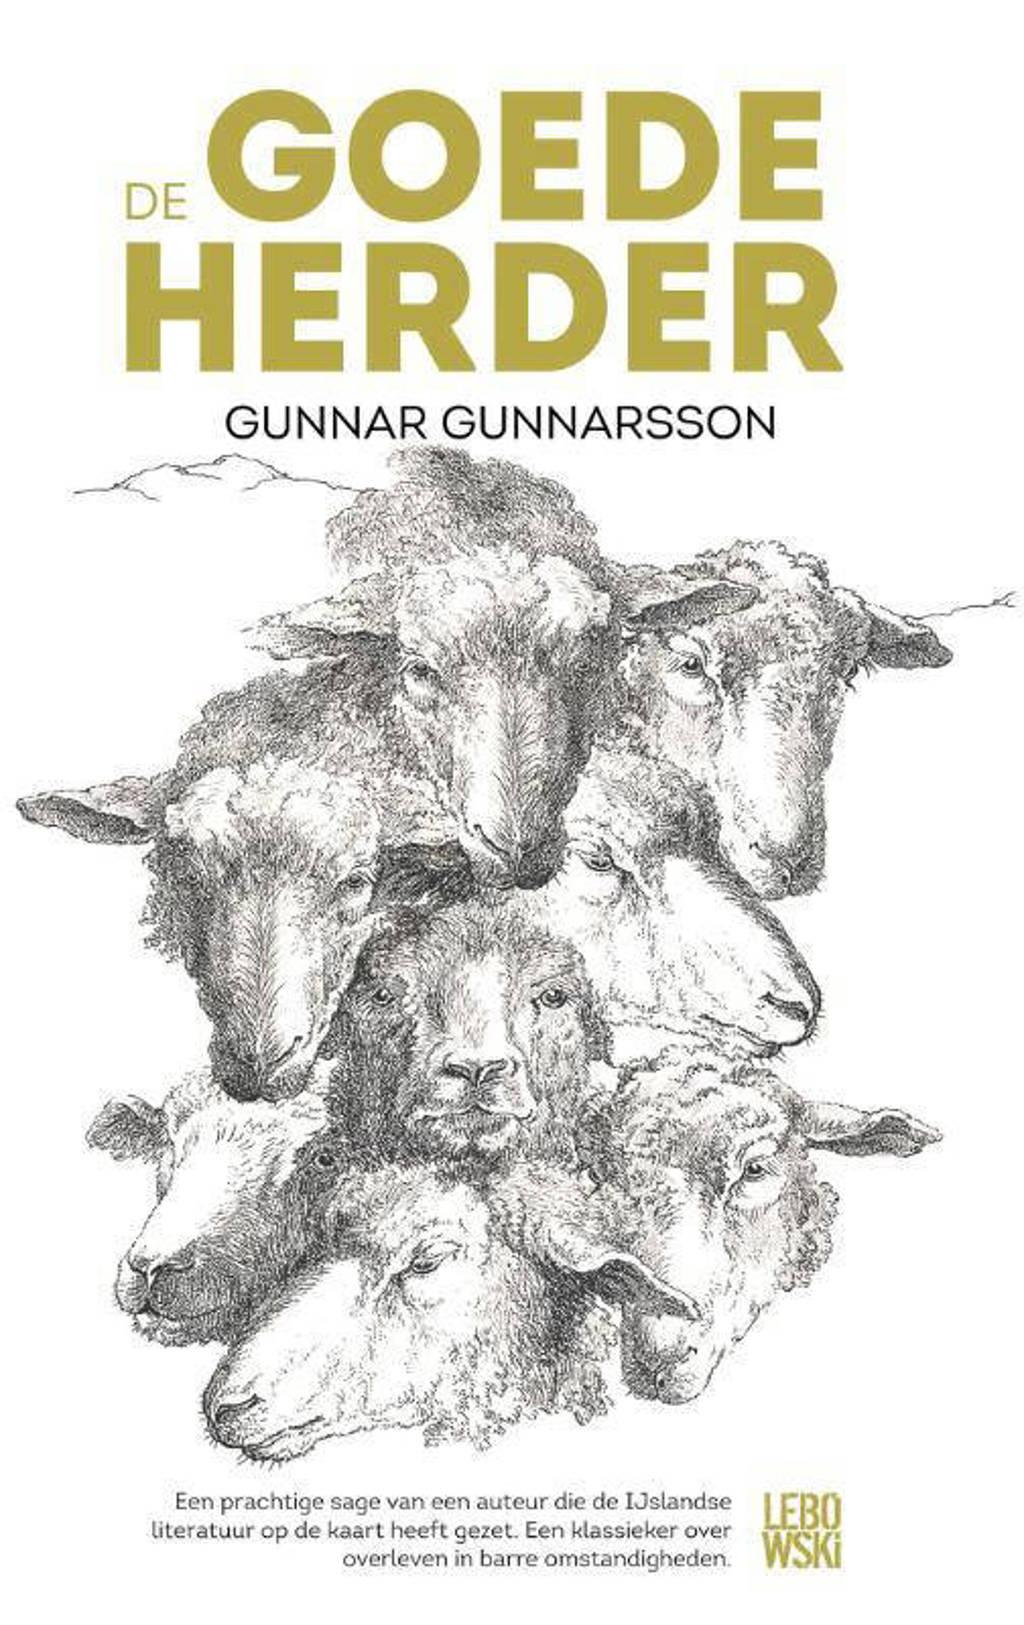 De goede herder - Gunnar Gunnarsson